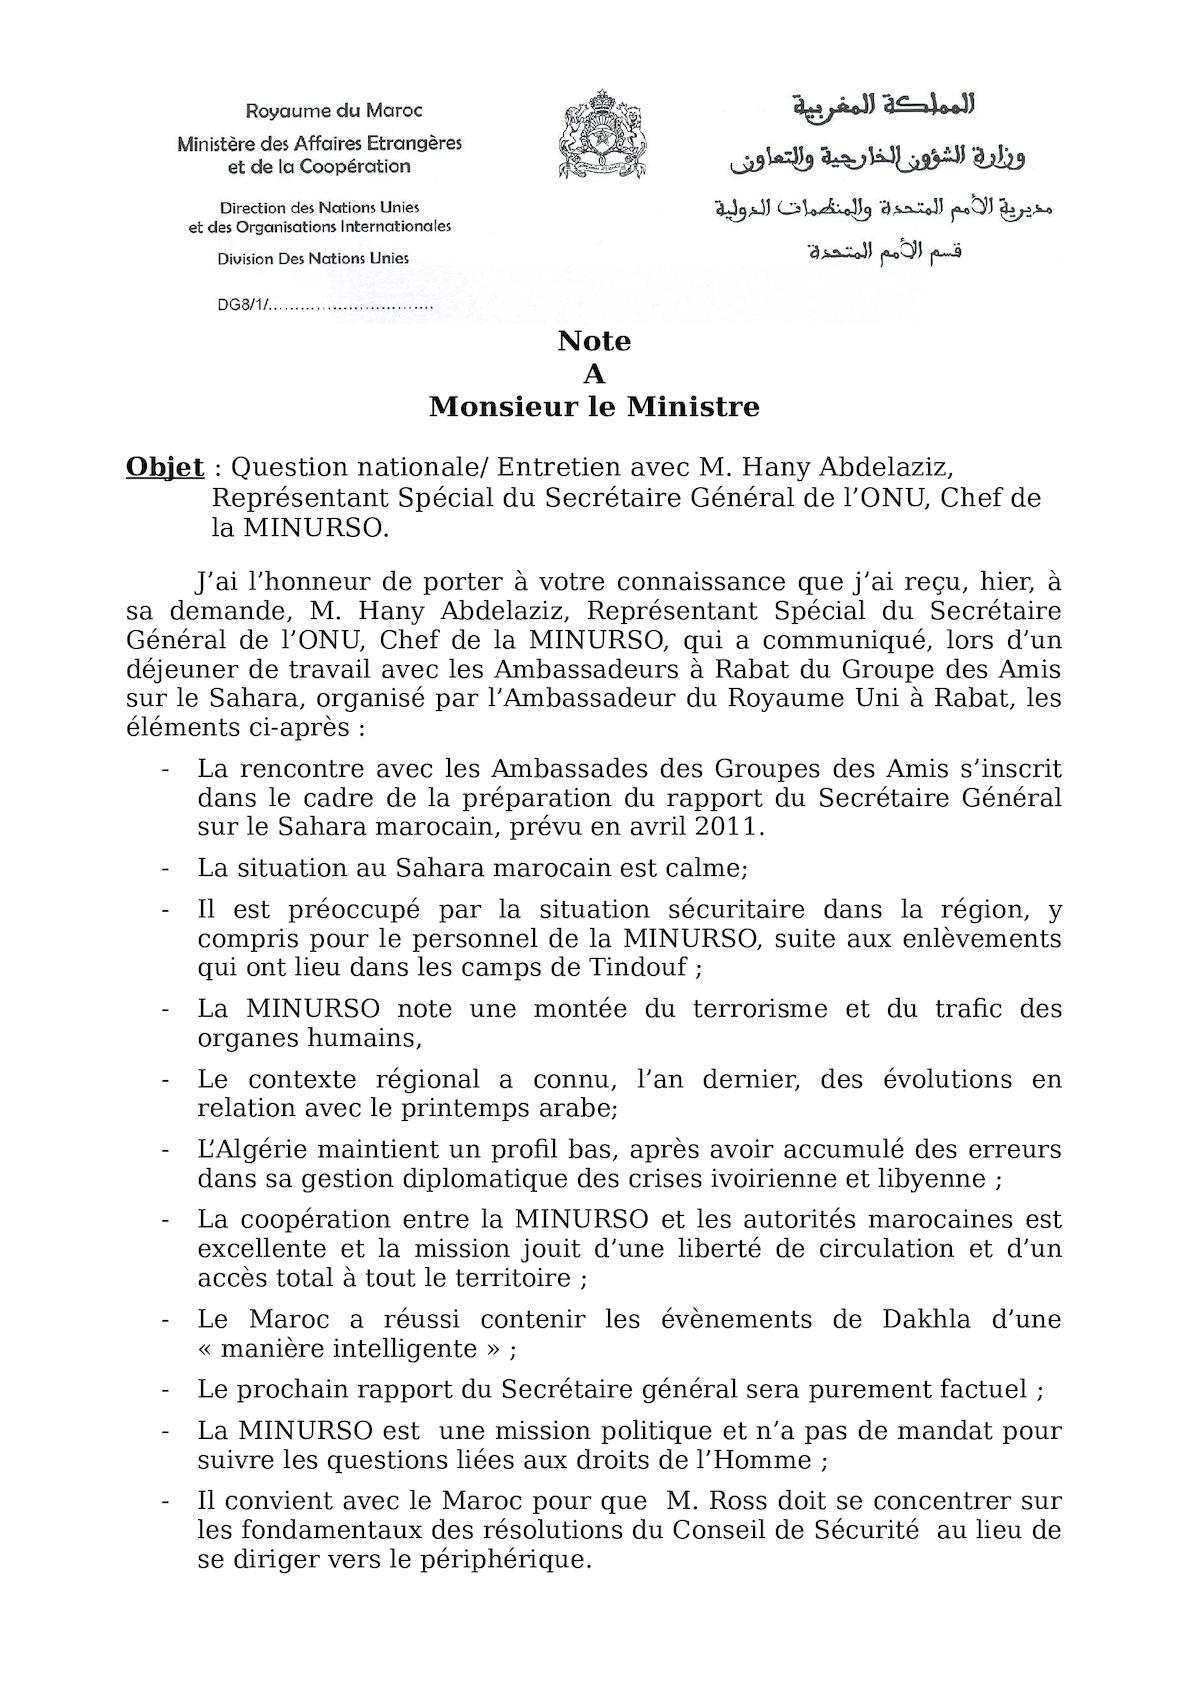 Note Entretien Avec Hany Abdelaziz 12 Janvier 2012